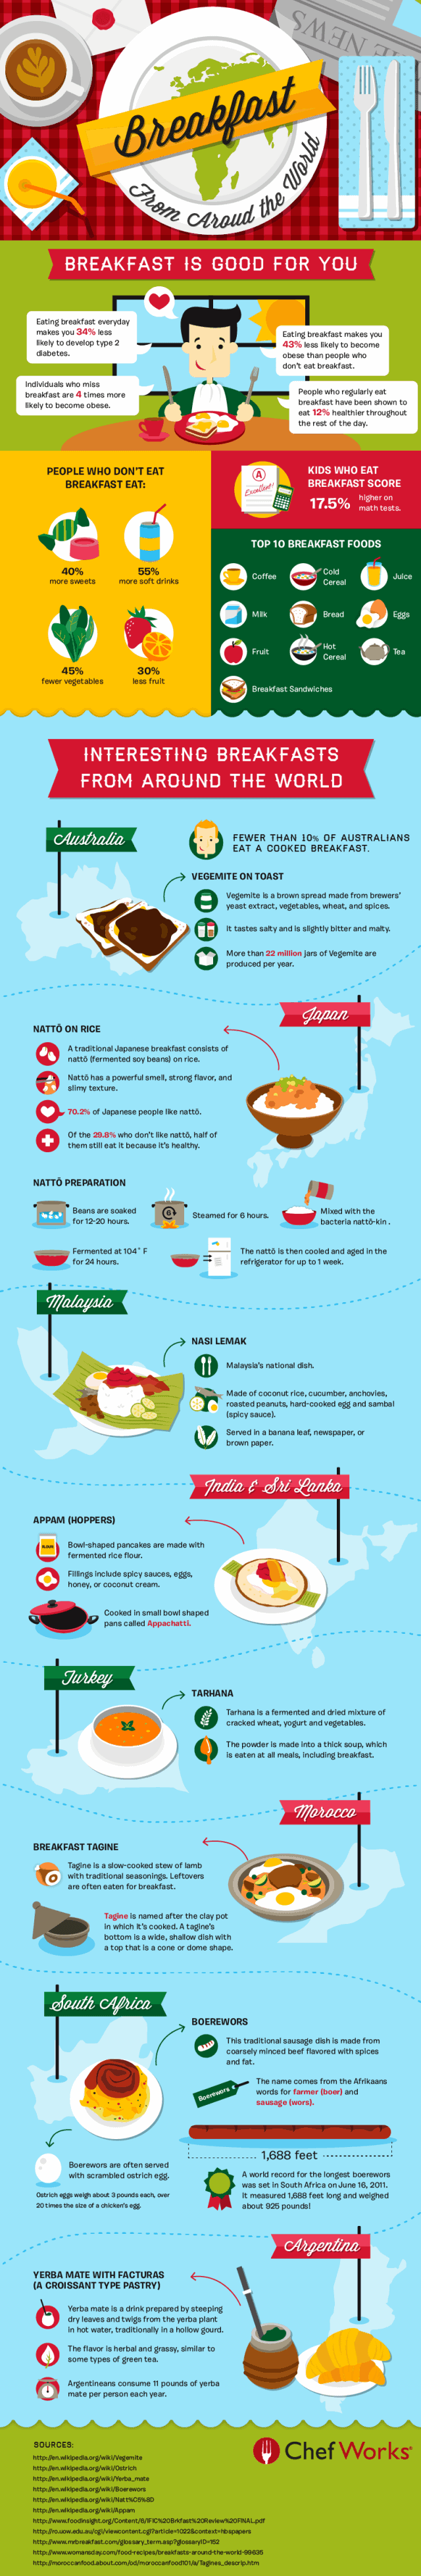 Breakfast From Around the World